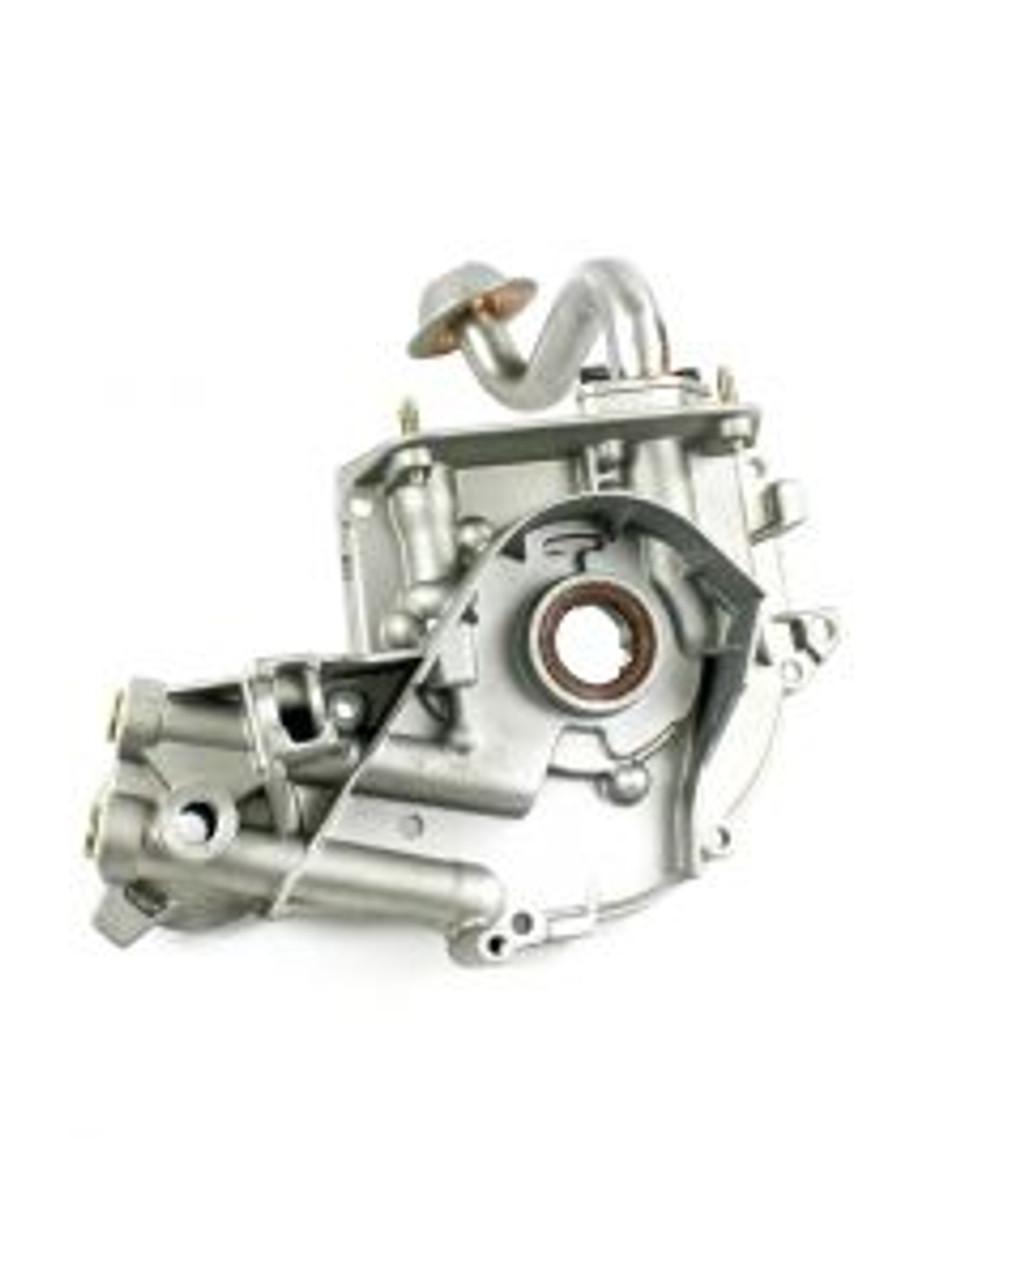 Oil Pump 1.4L 2016 Fiat 500 - OP4254.9